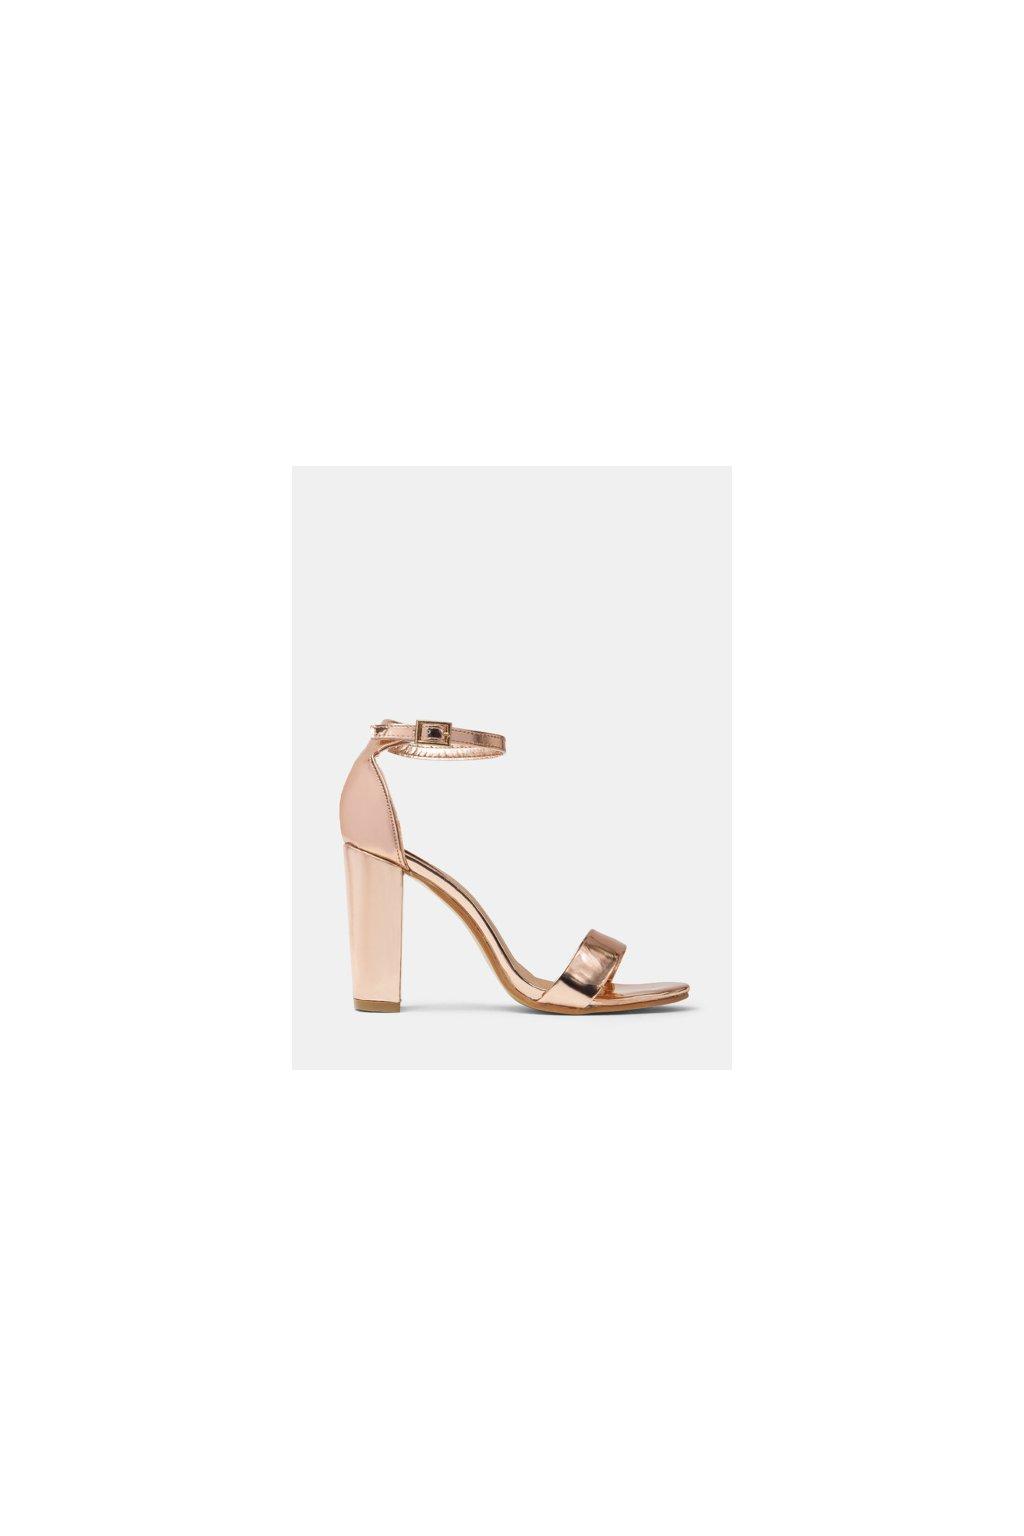 rose gold sandalki na slupku catelyn 2590837 412729 2